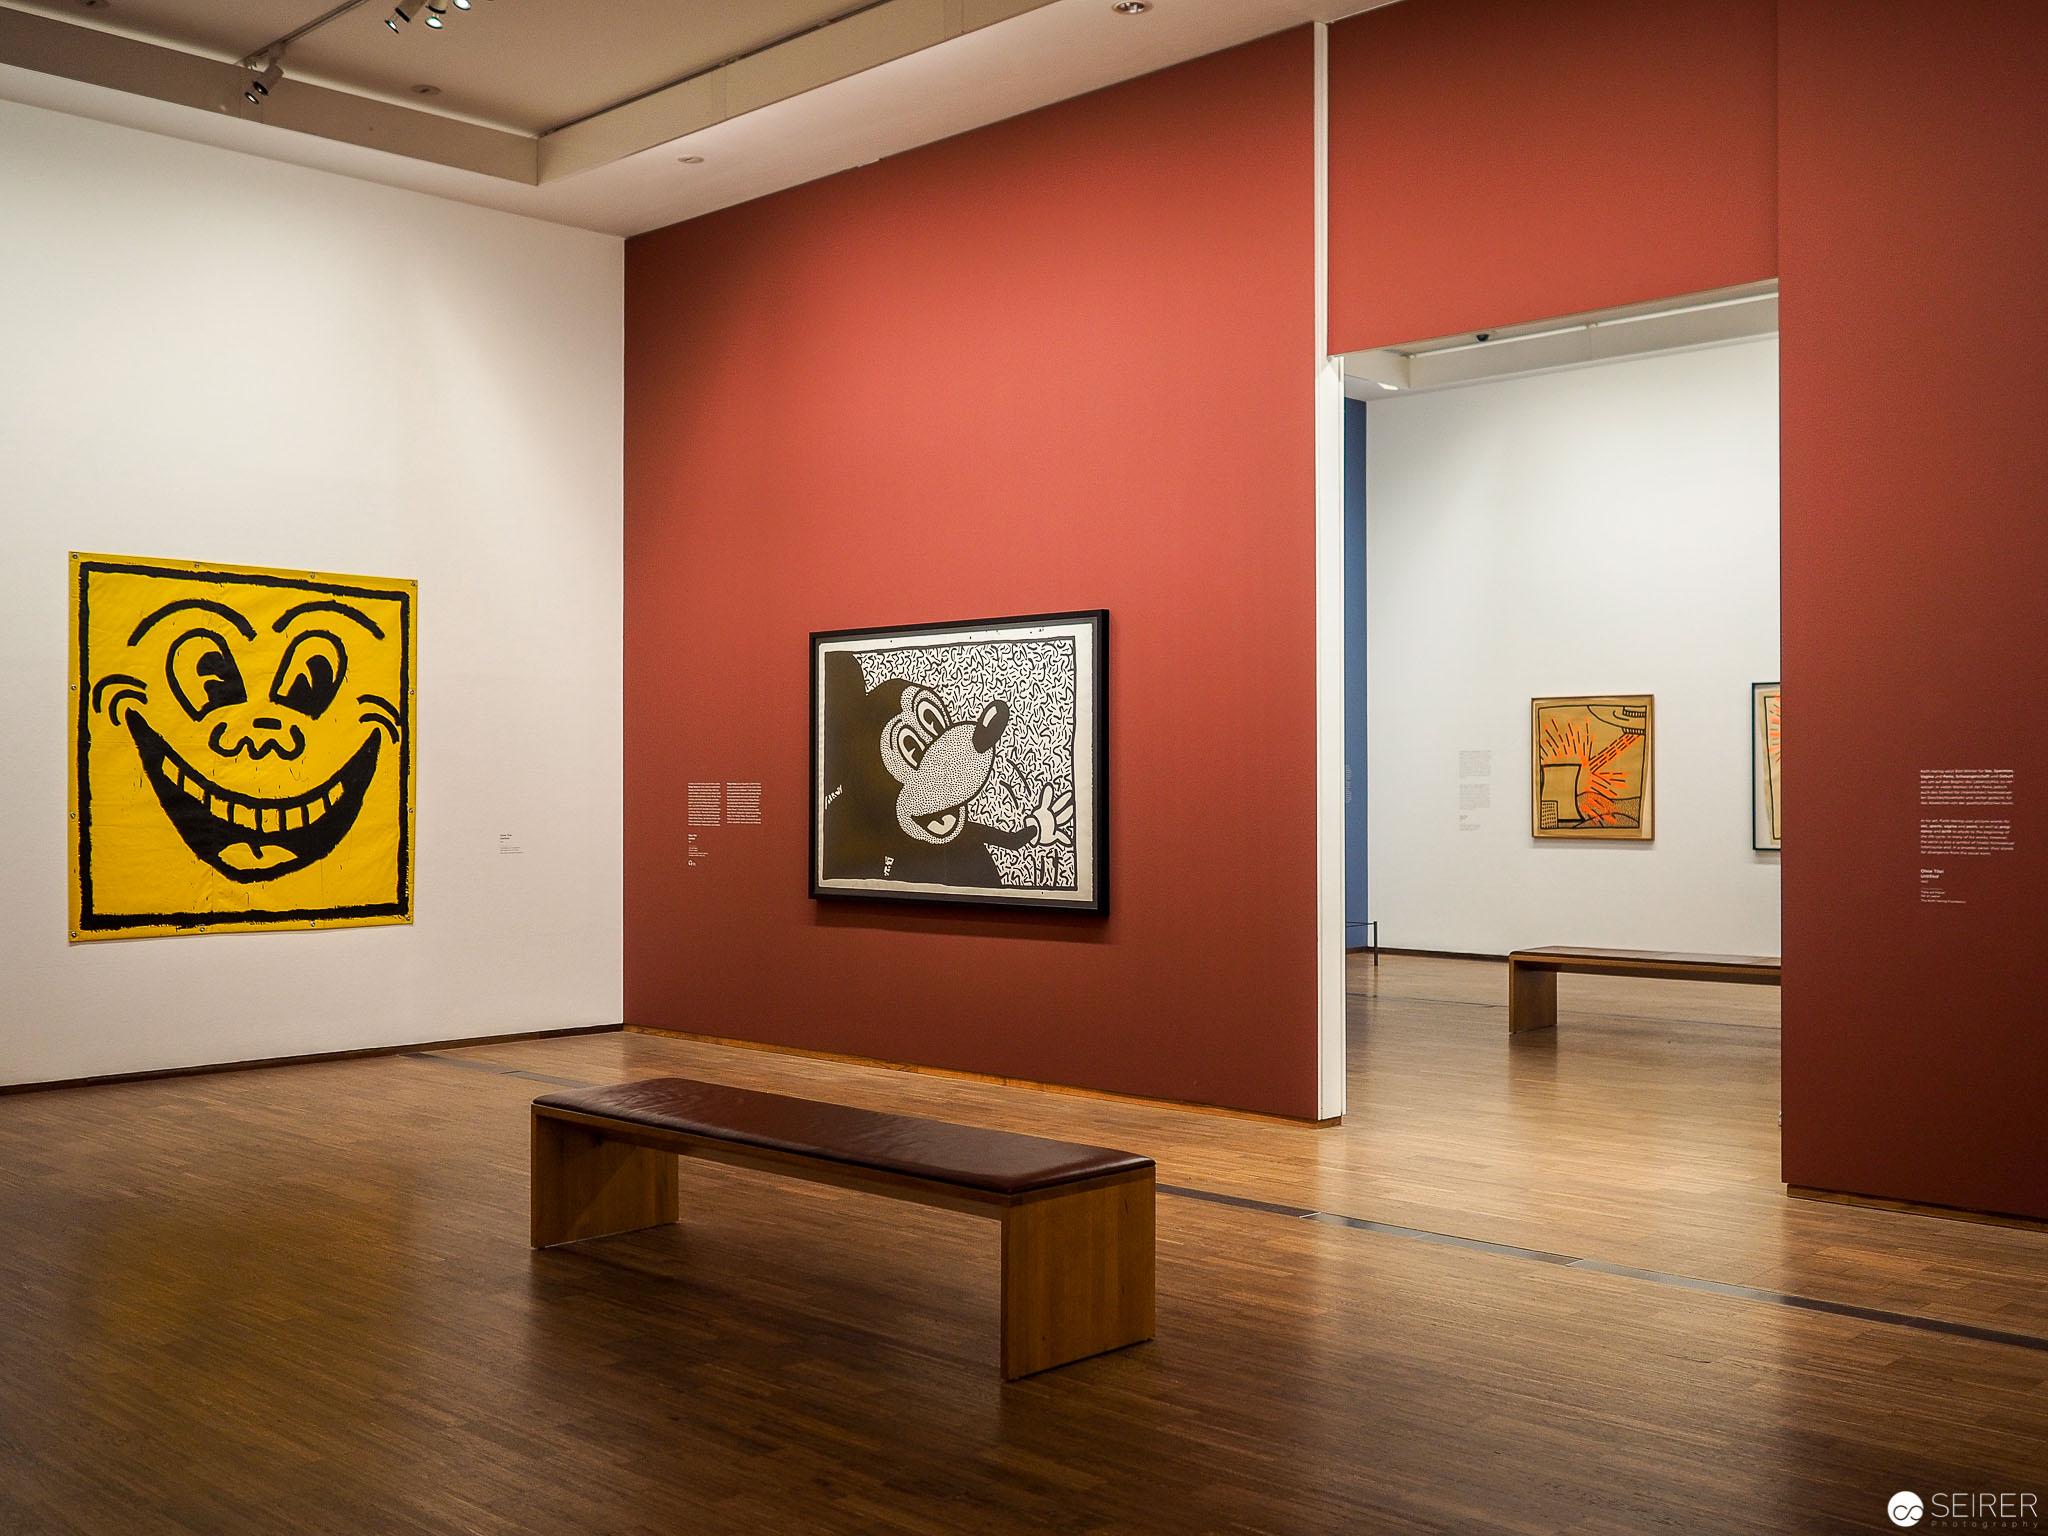 Keith Haring. The Alphabet exhibition at Albertina